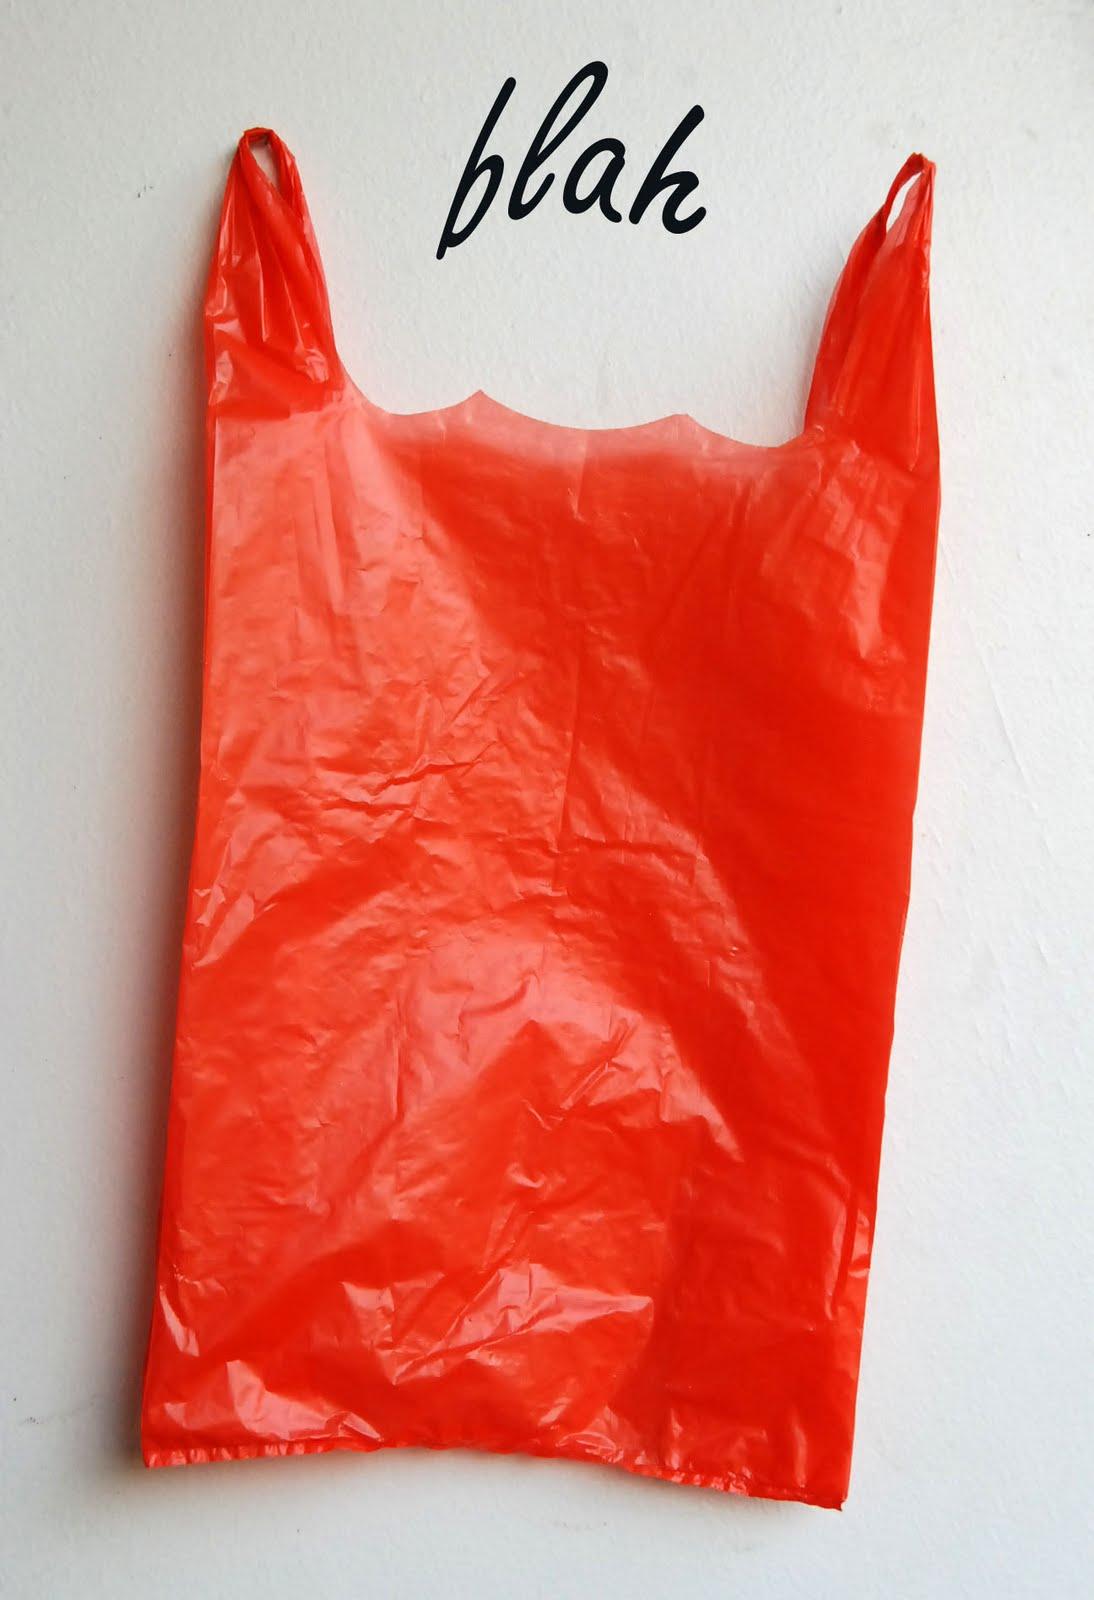 Blah To Tada Challenge Plastic Bags